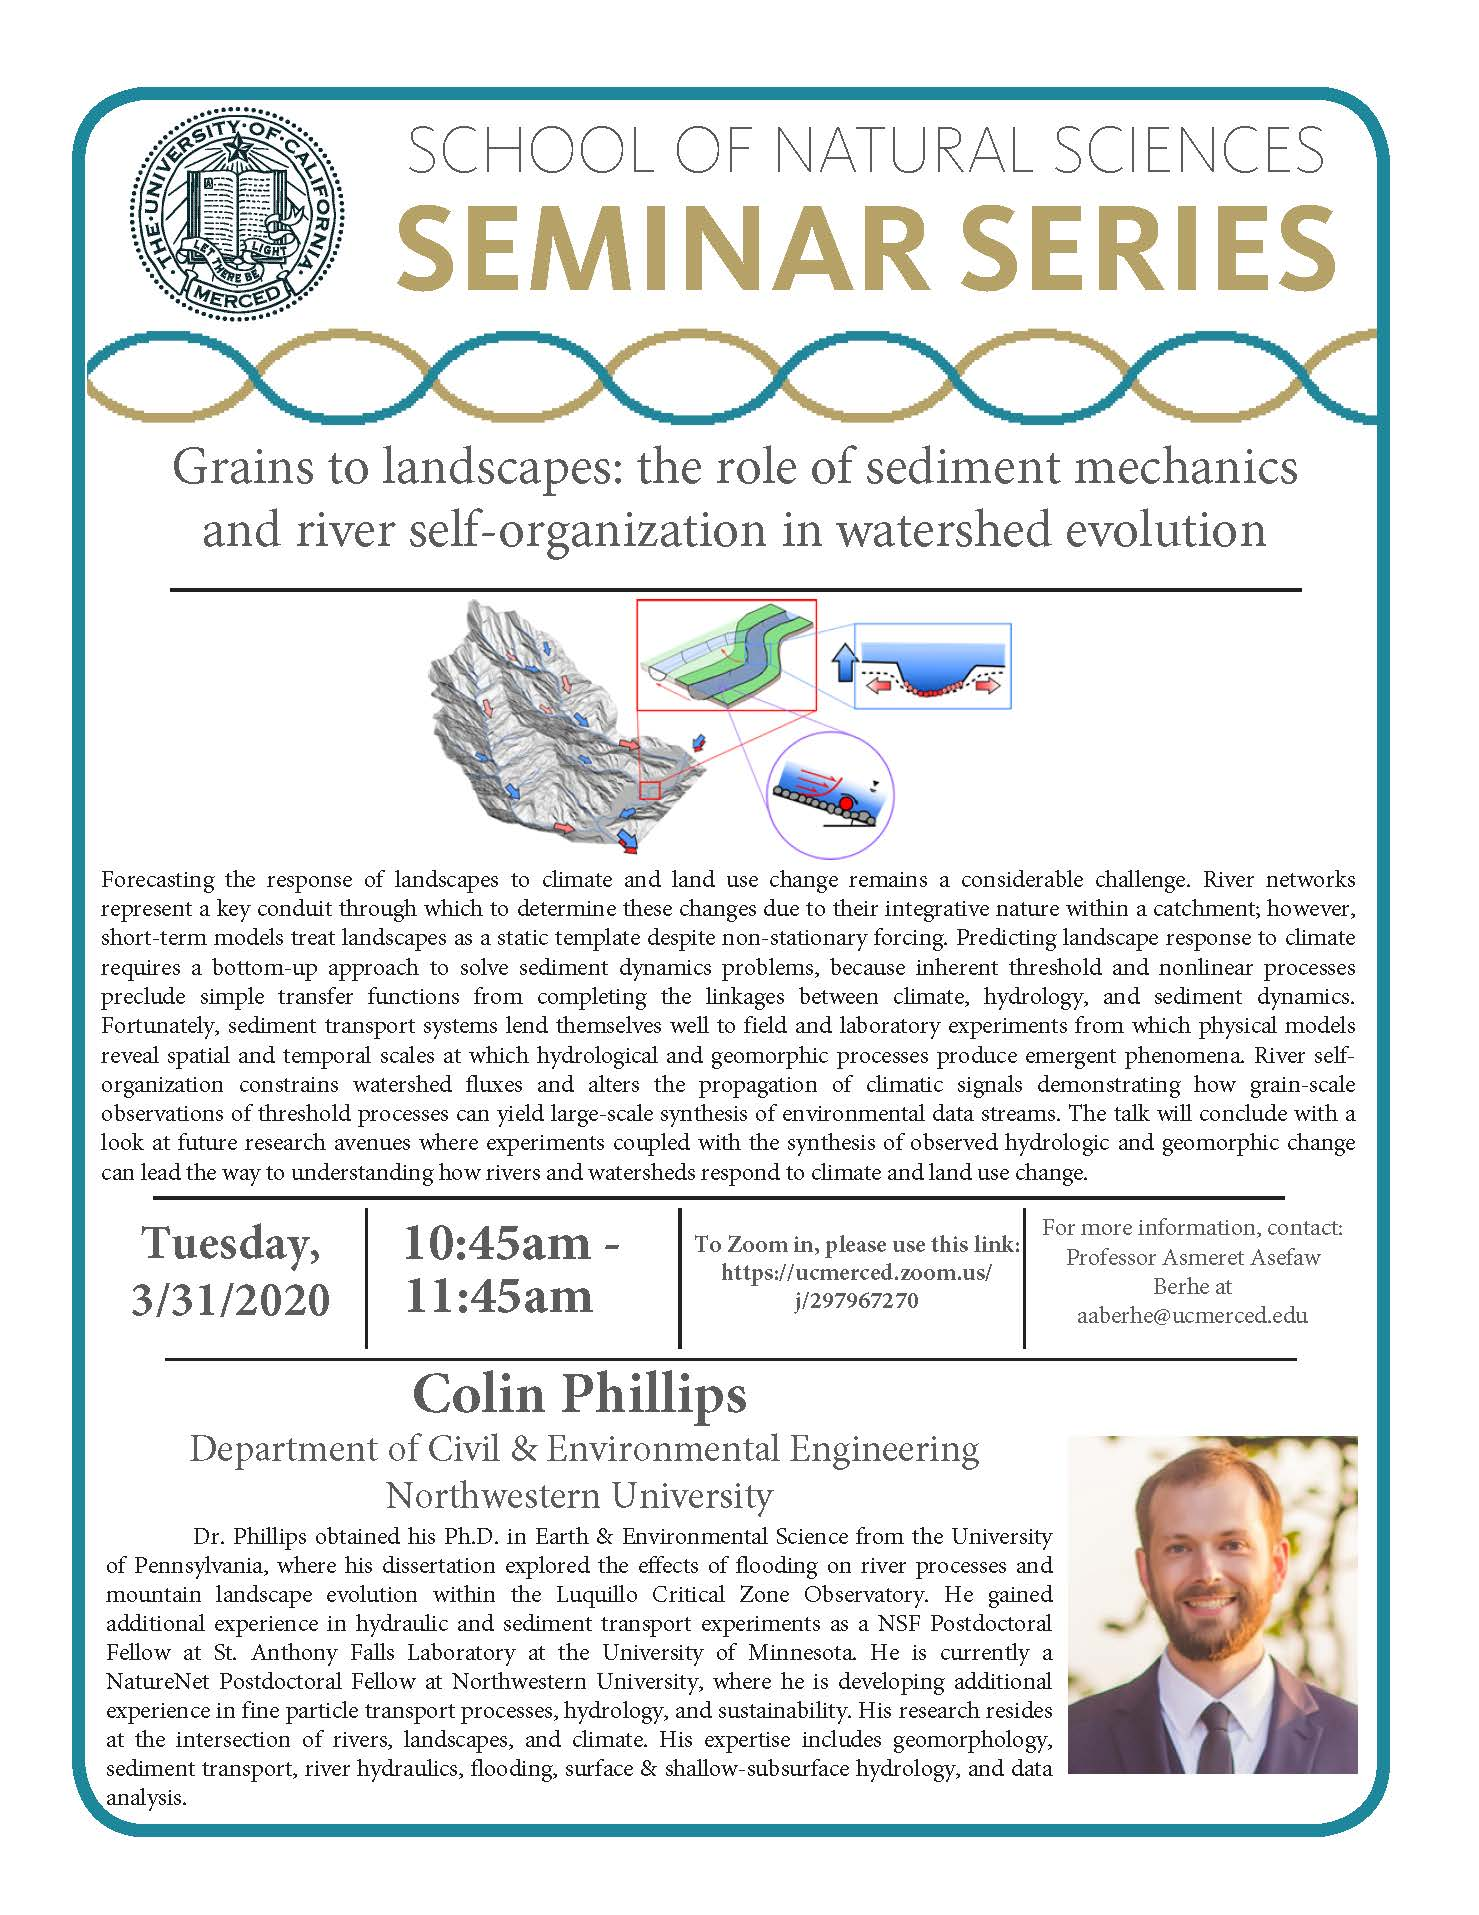 LES Seminar for Dr. Colin Phillips